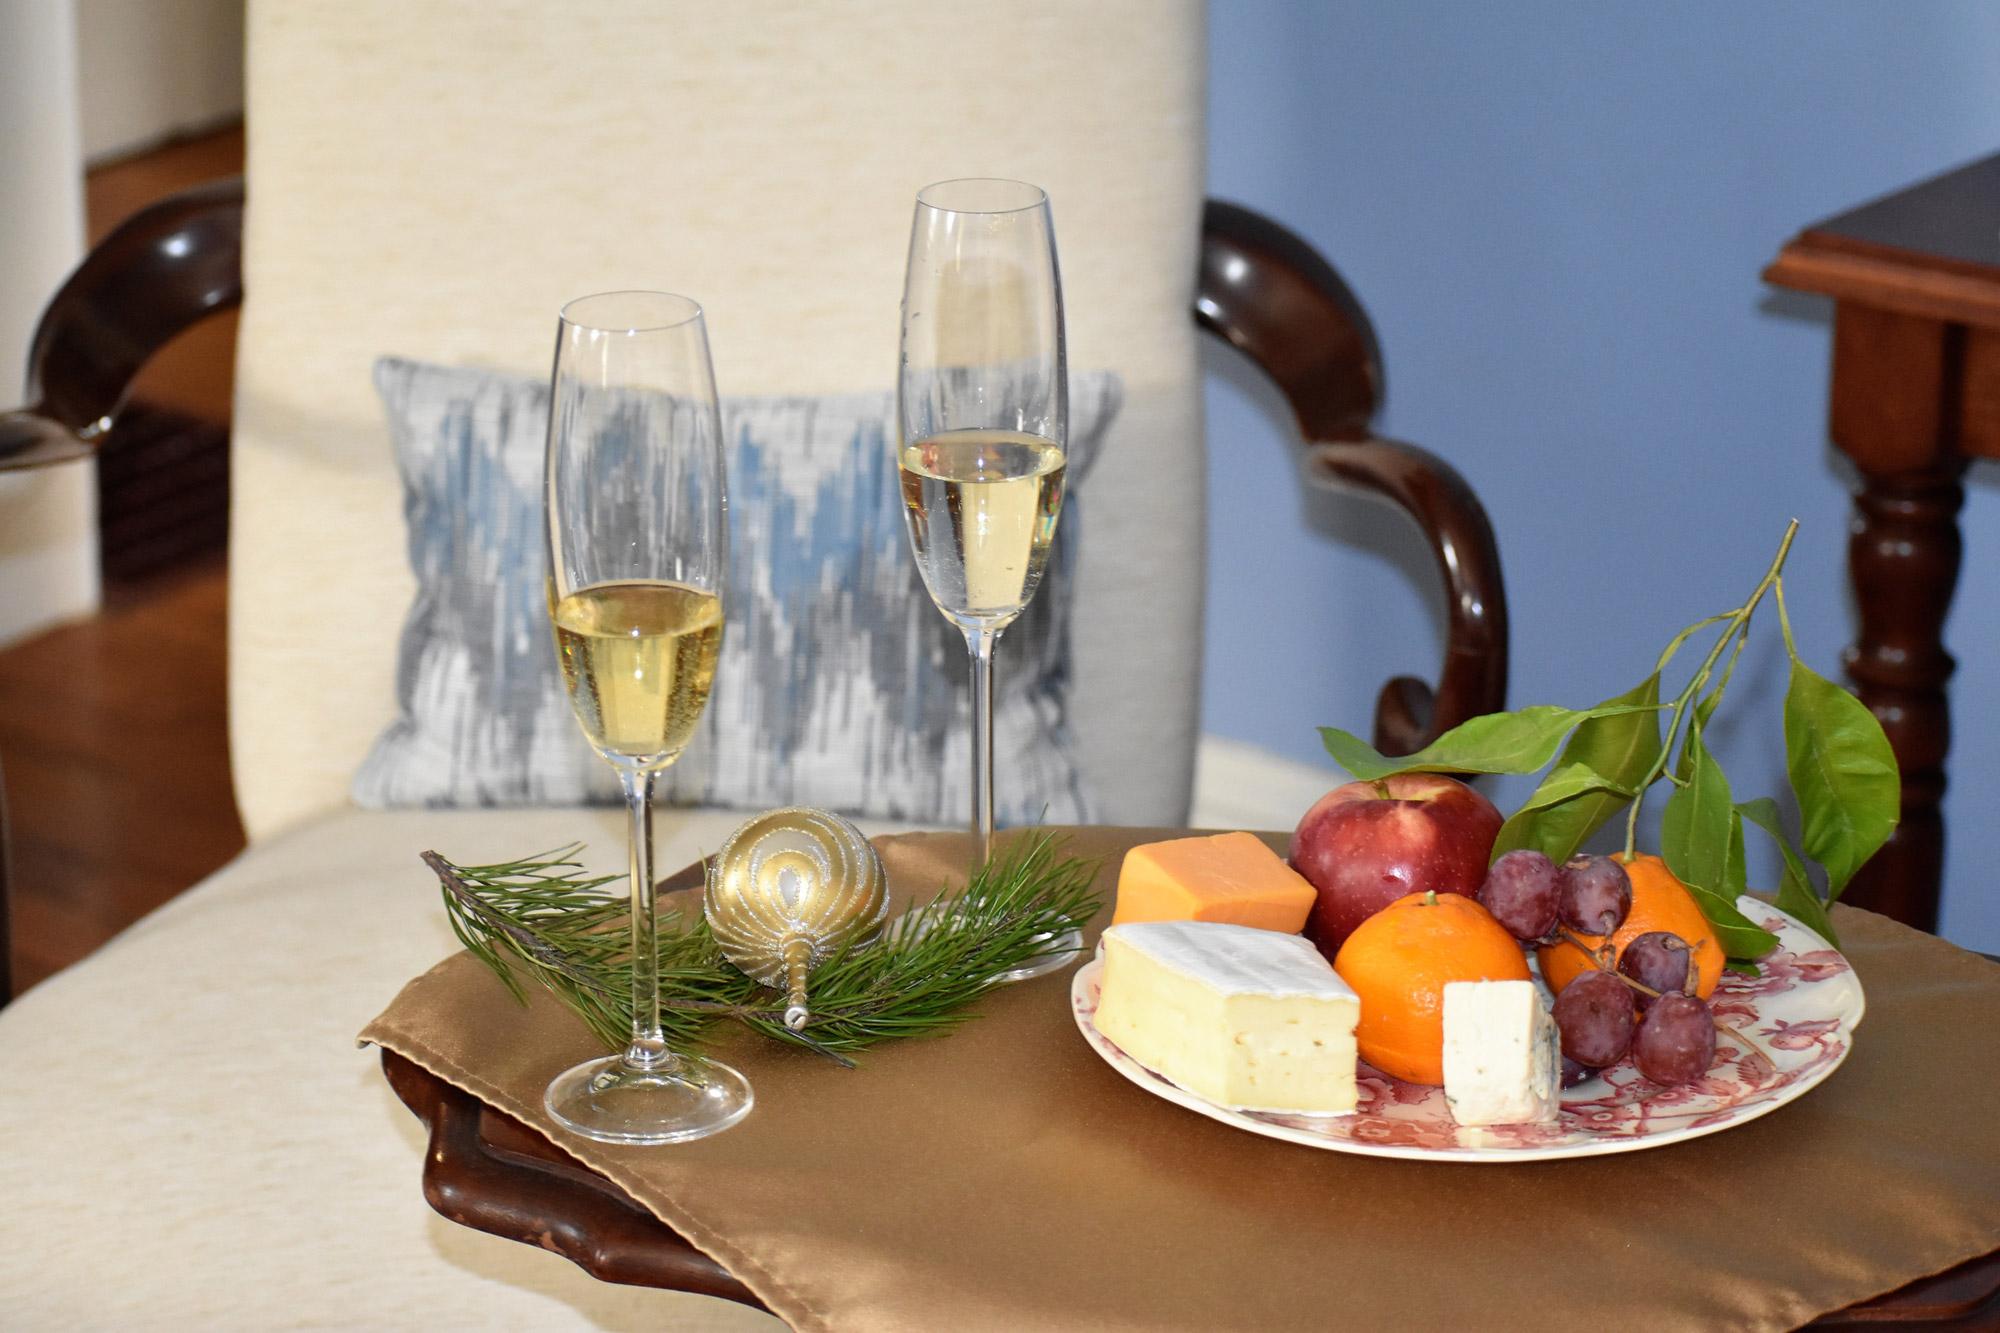 Winter Service Seasonal Fruits and Cheeses